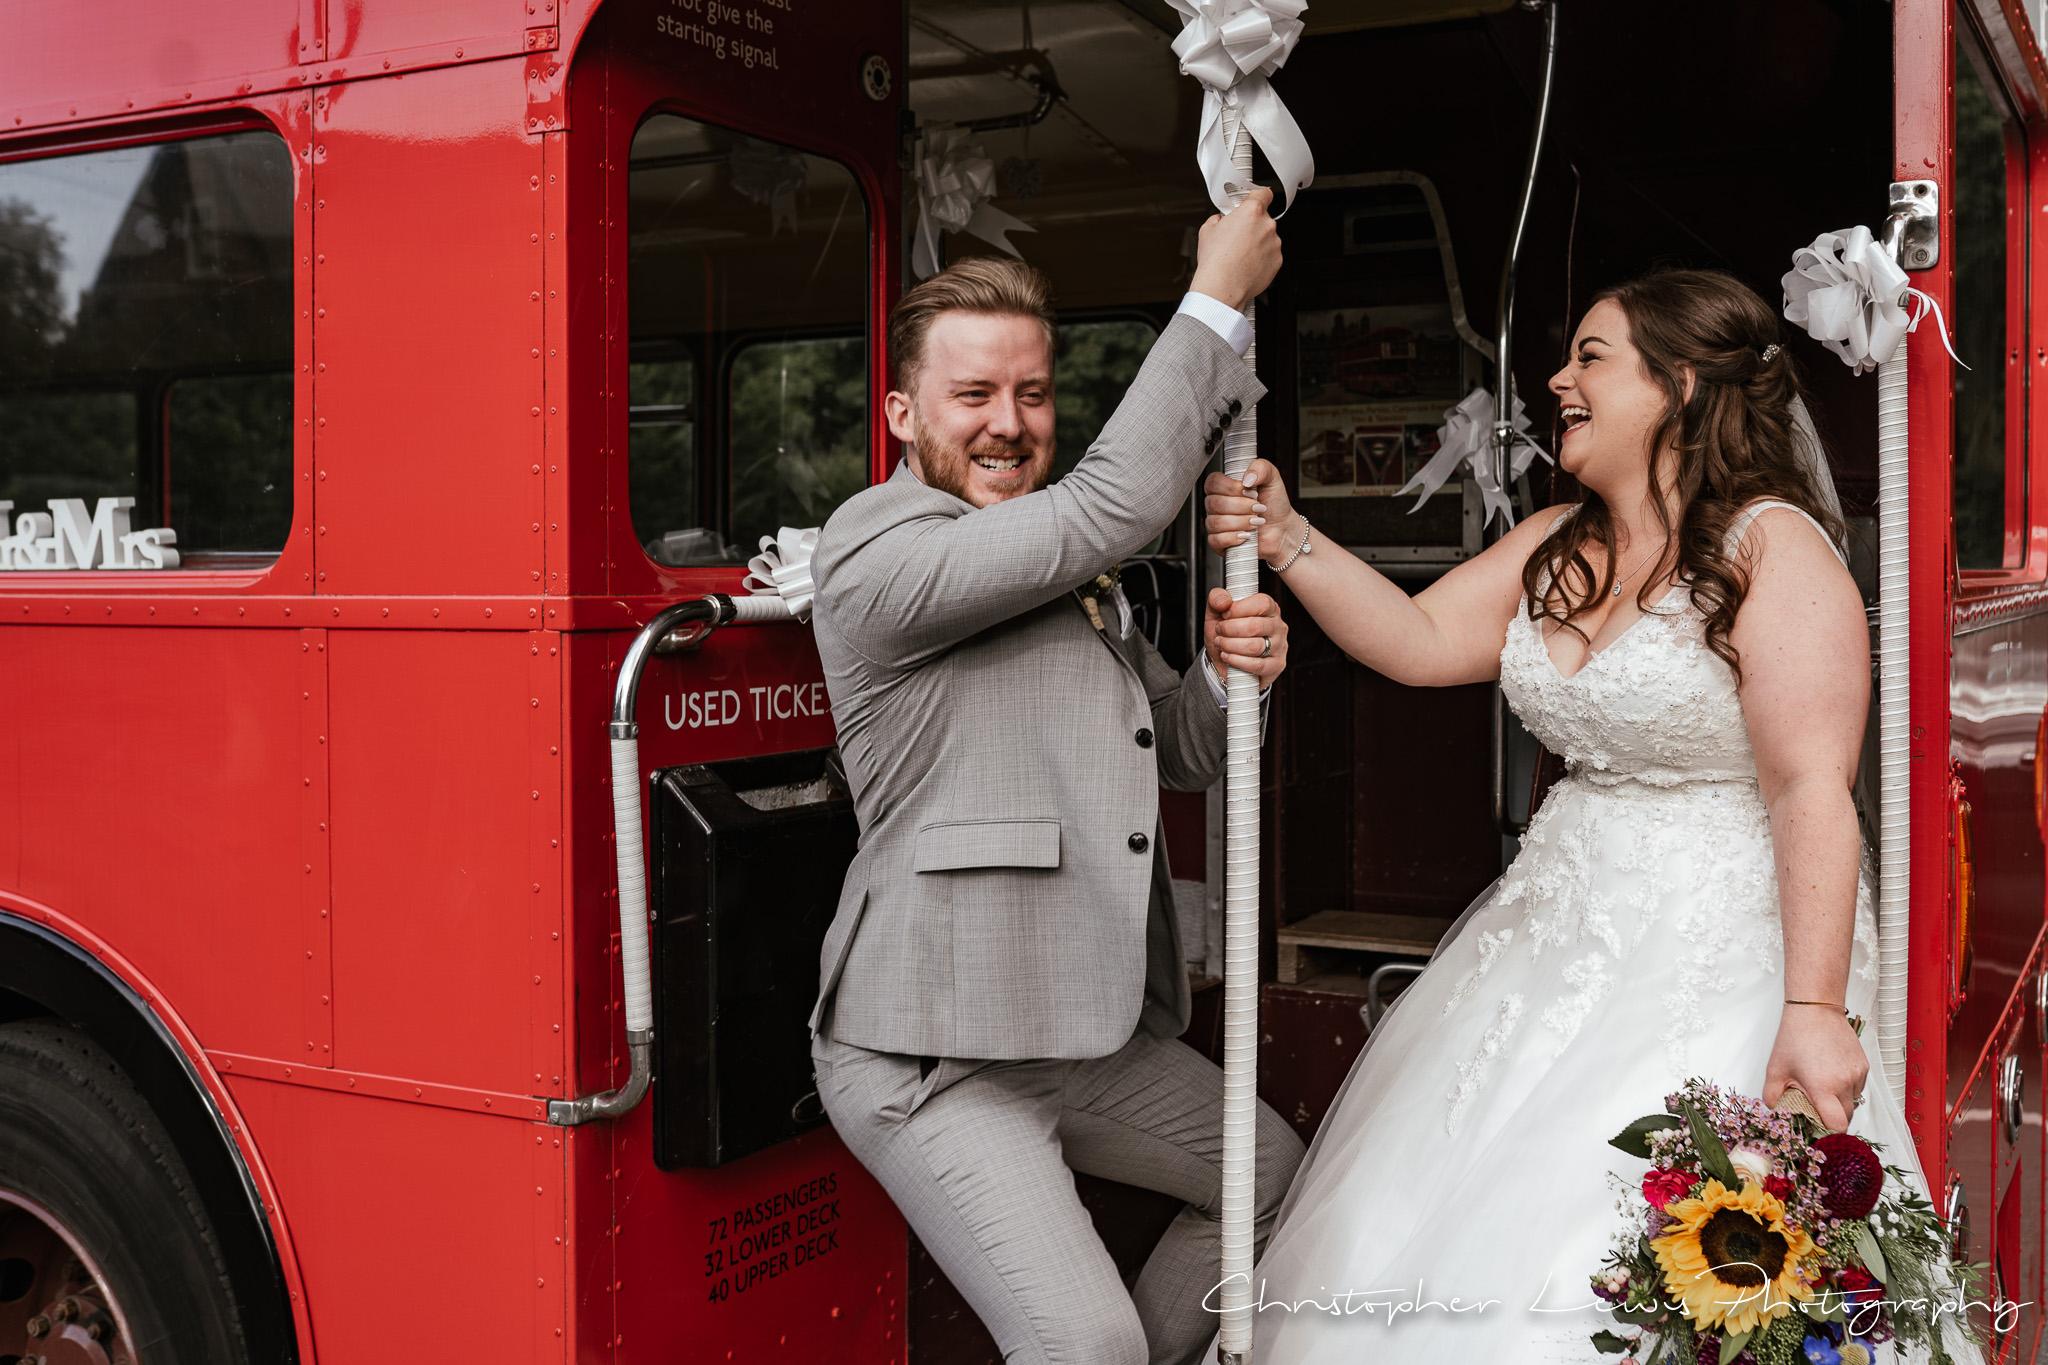 Samlesbury Hall Wedding wedding bus